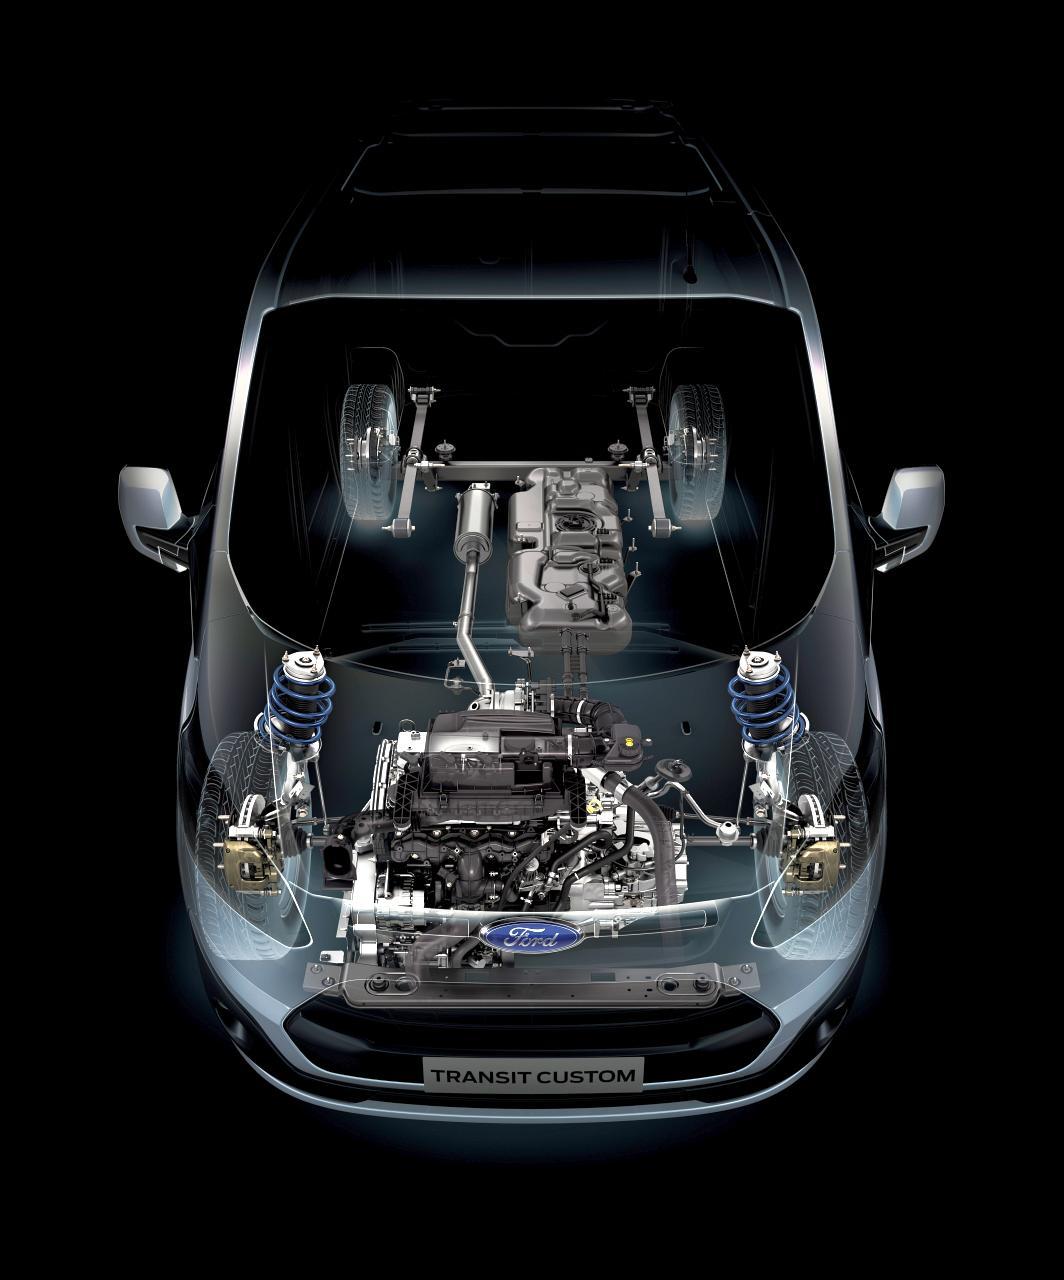 Ford TRANSIT CUSTOM - Moderne 2,2l TDCi Motoren